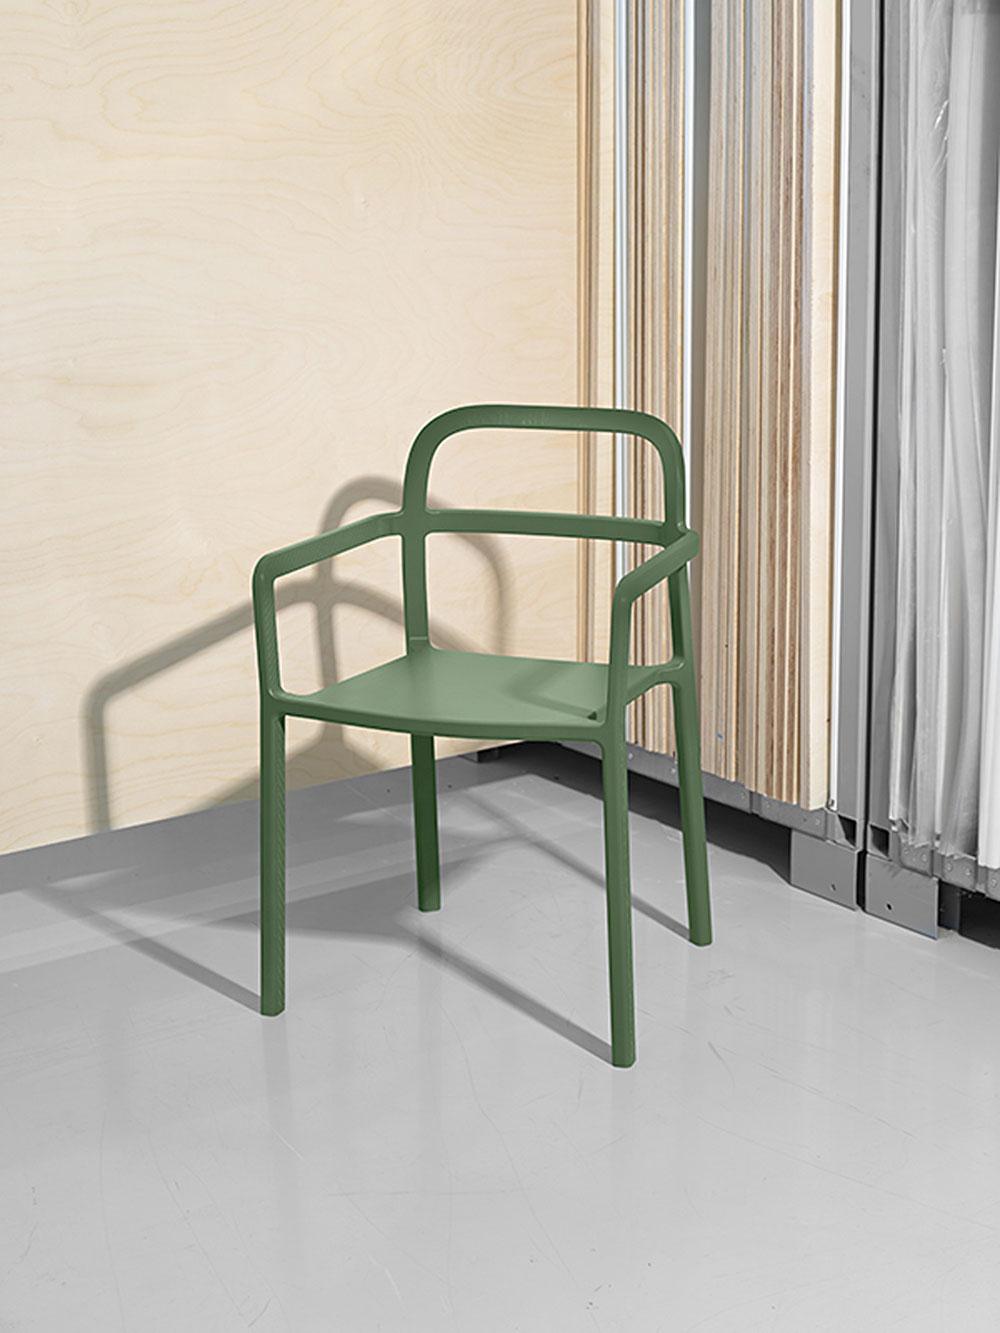 Ikea-Hay-Collaboration-2017-Design-2